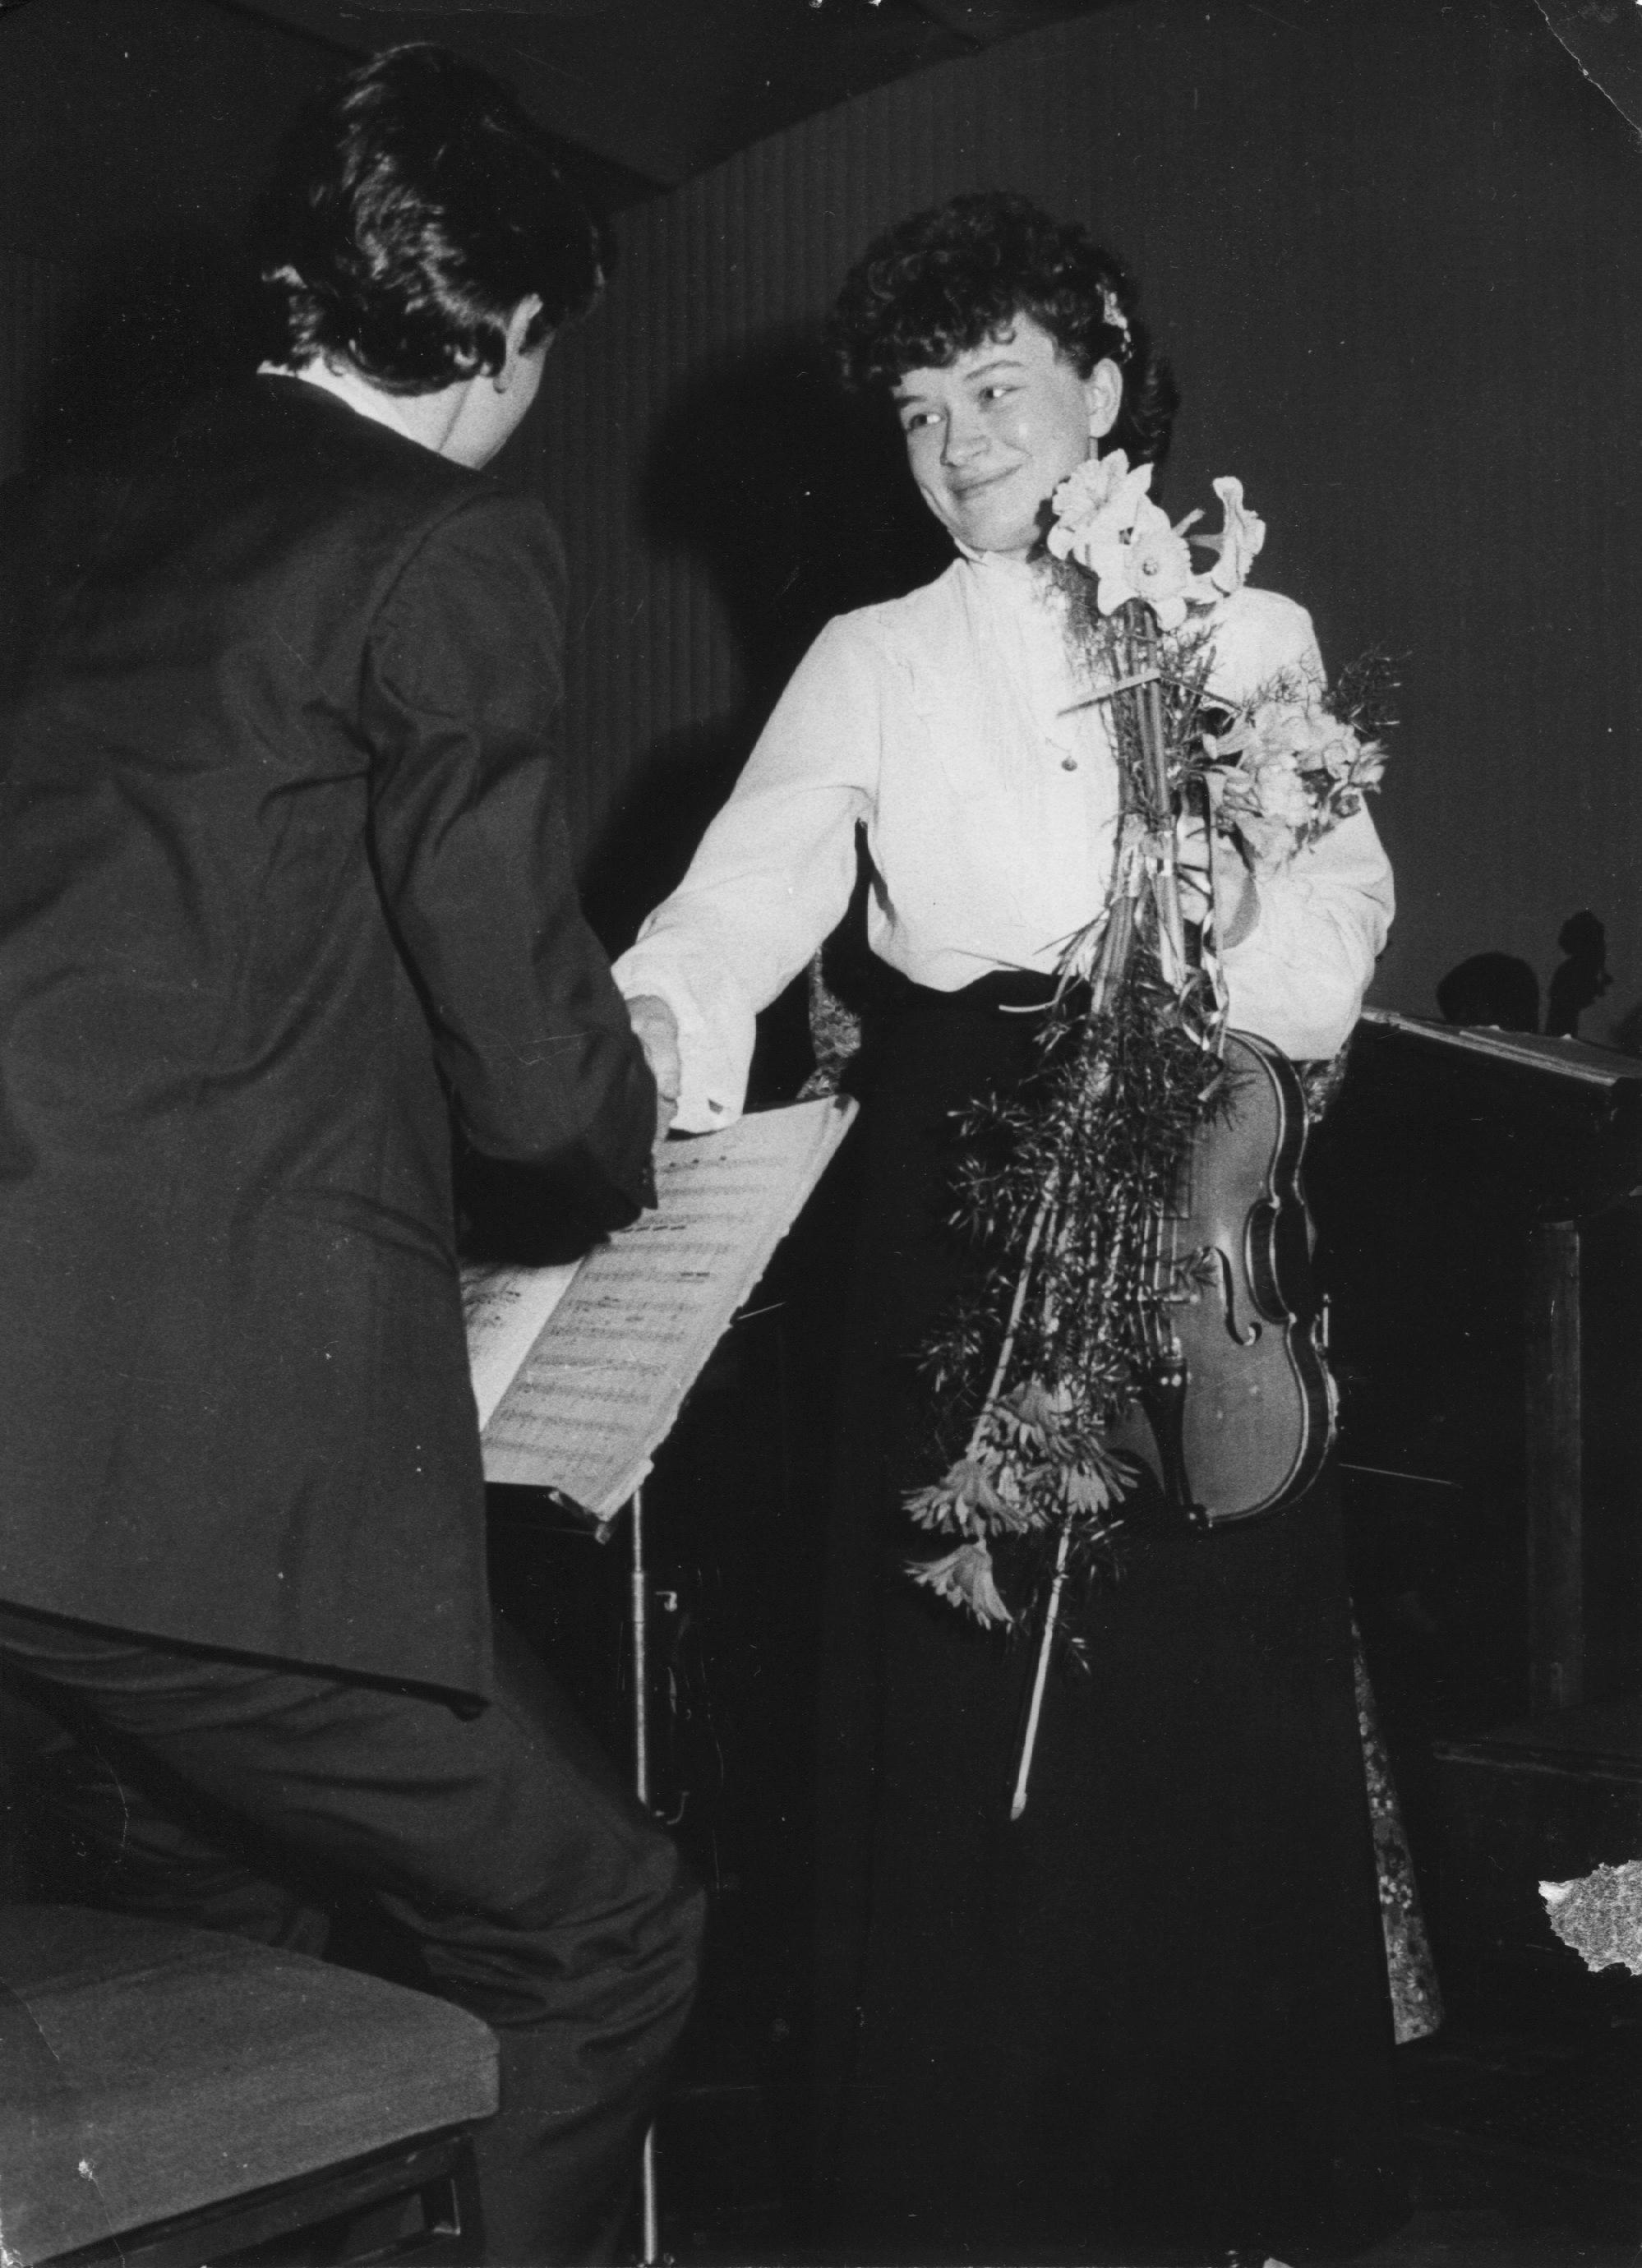 2b, After performance with the Szymanowski Liceum Symphony Orchestra, Poland, age 16